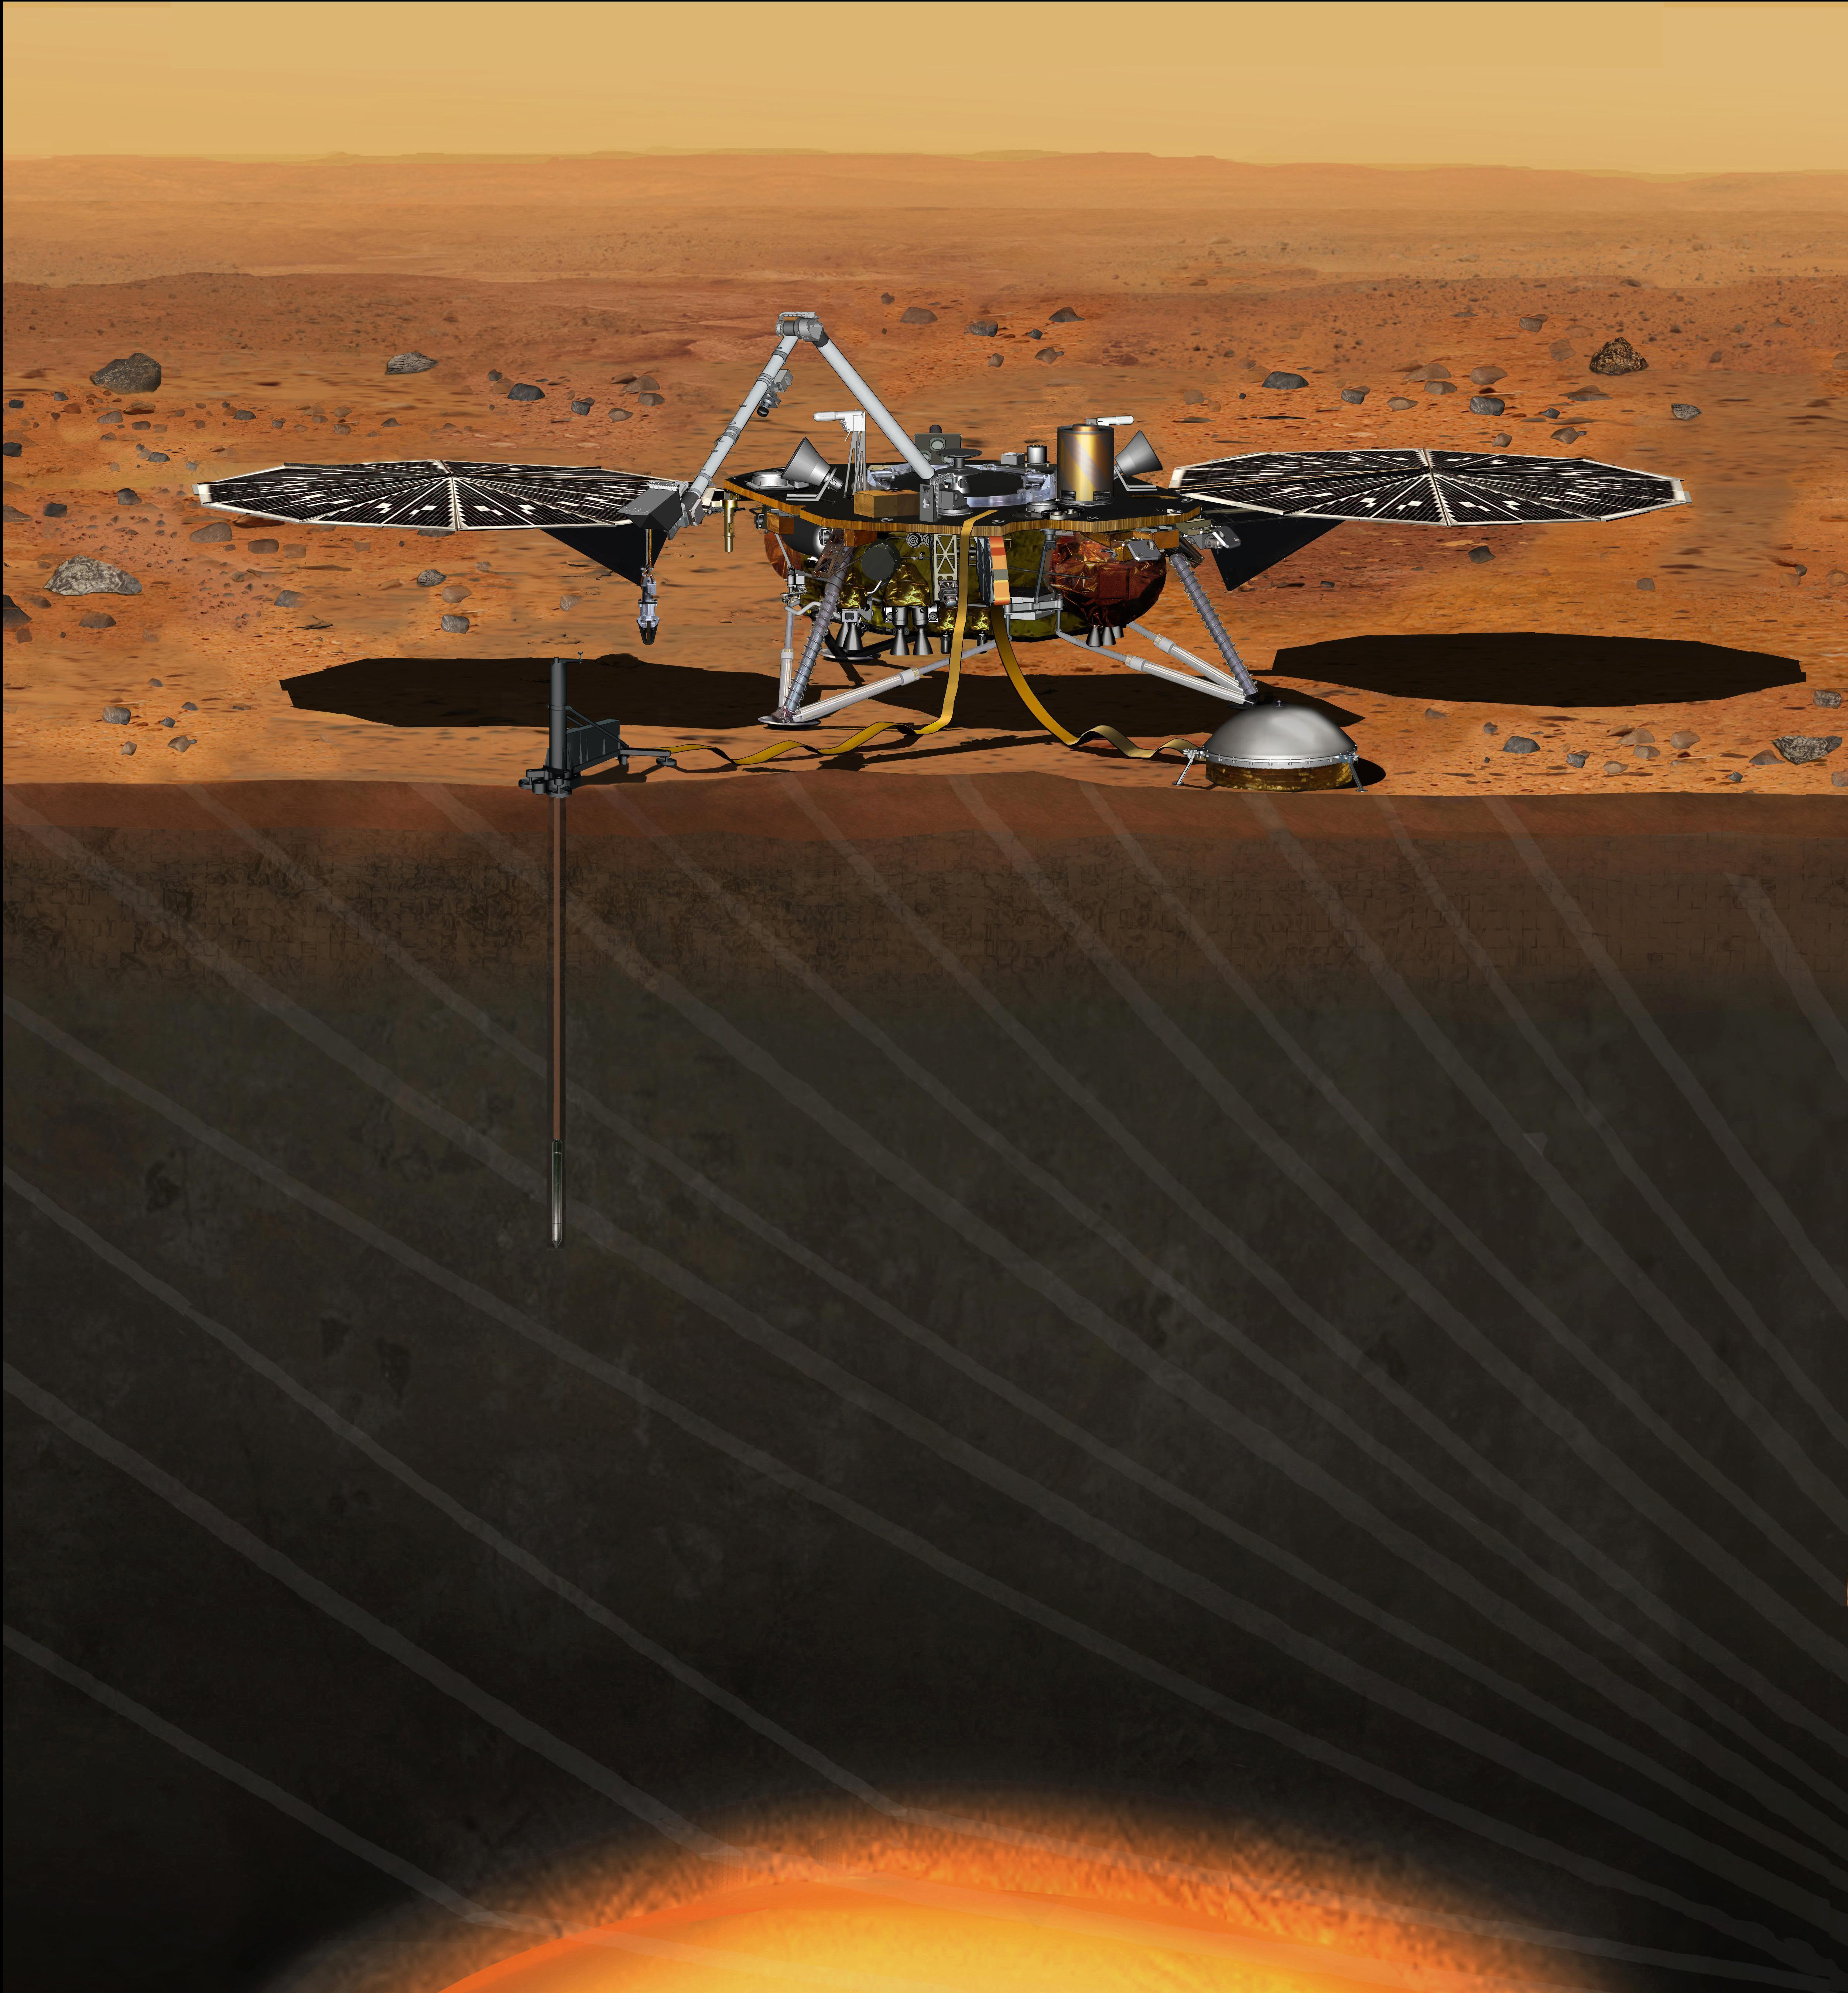 HANDOUT robot going to Mars